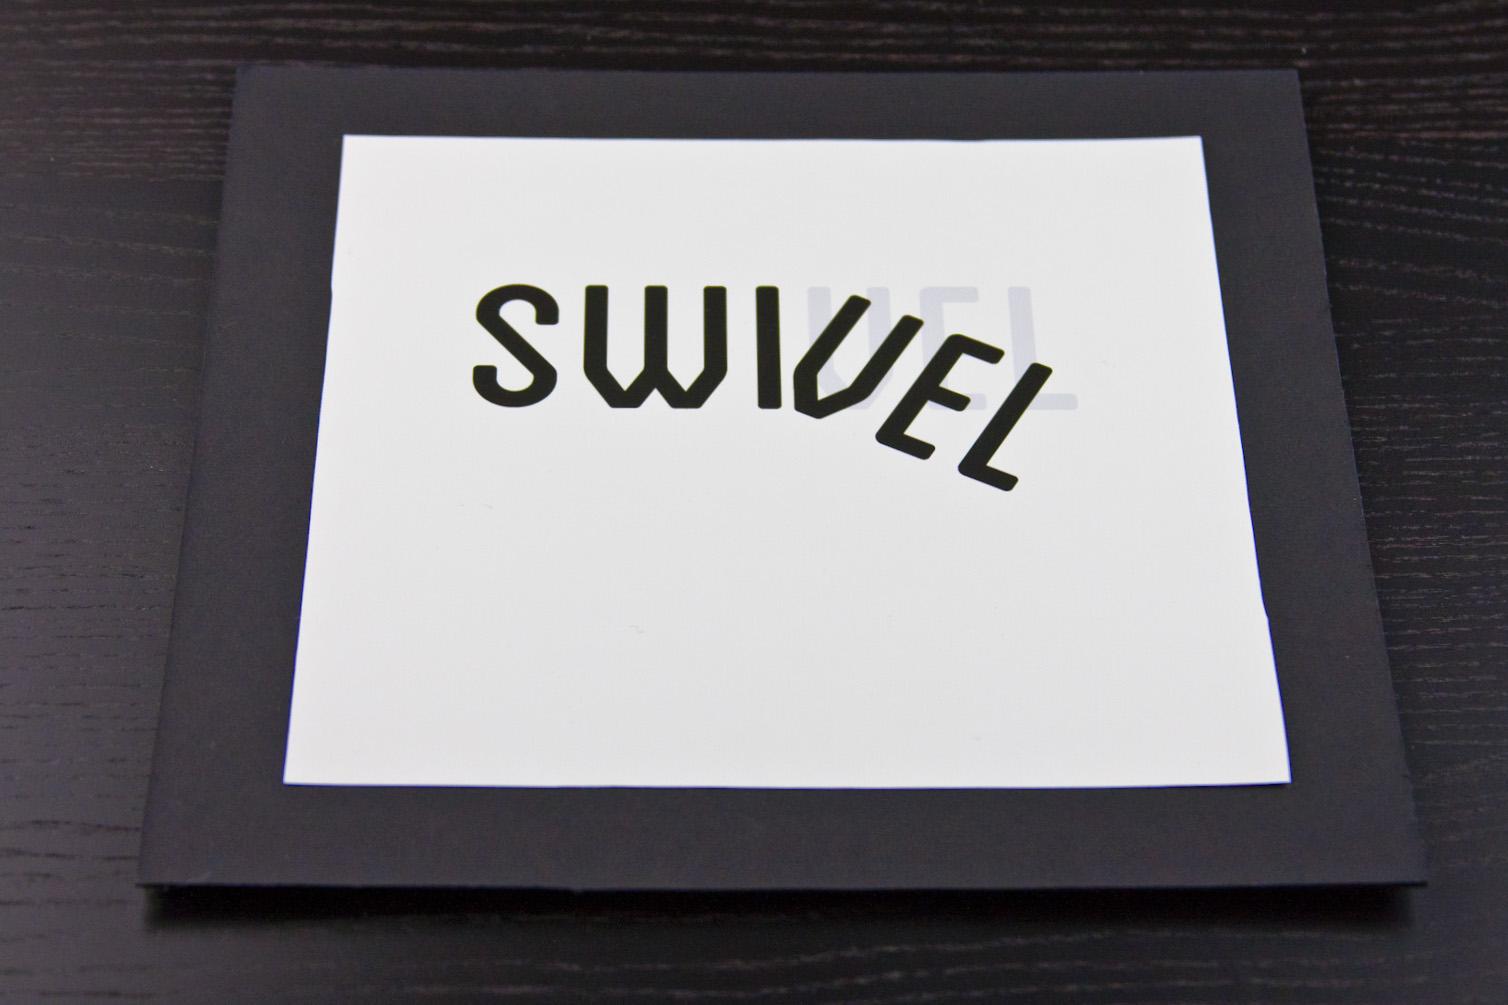 swivel text metaphor